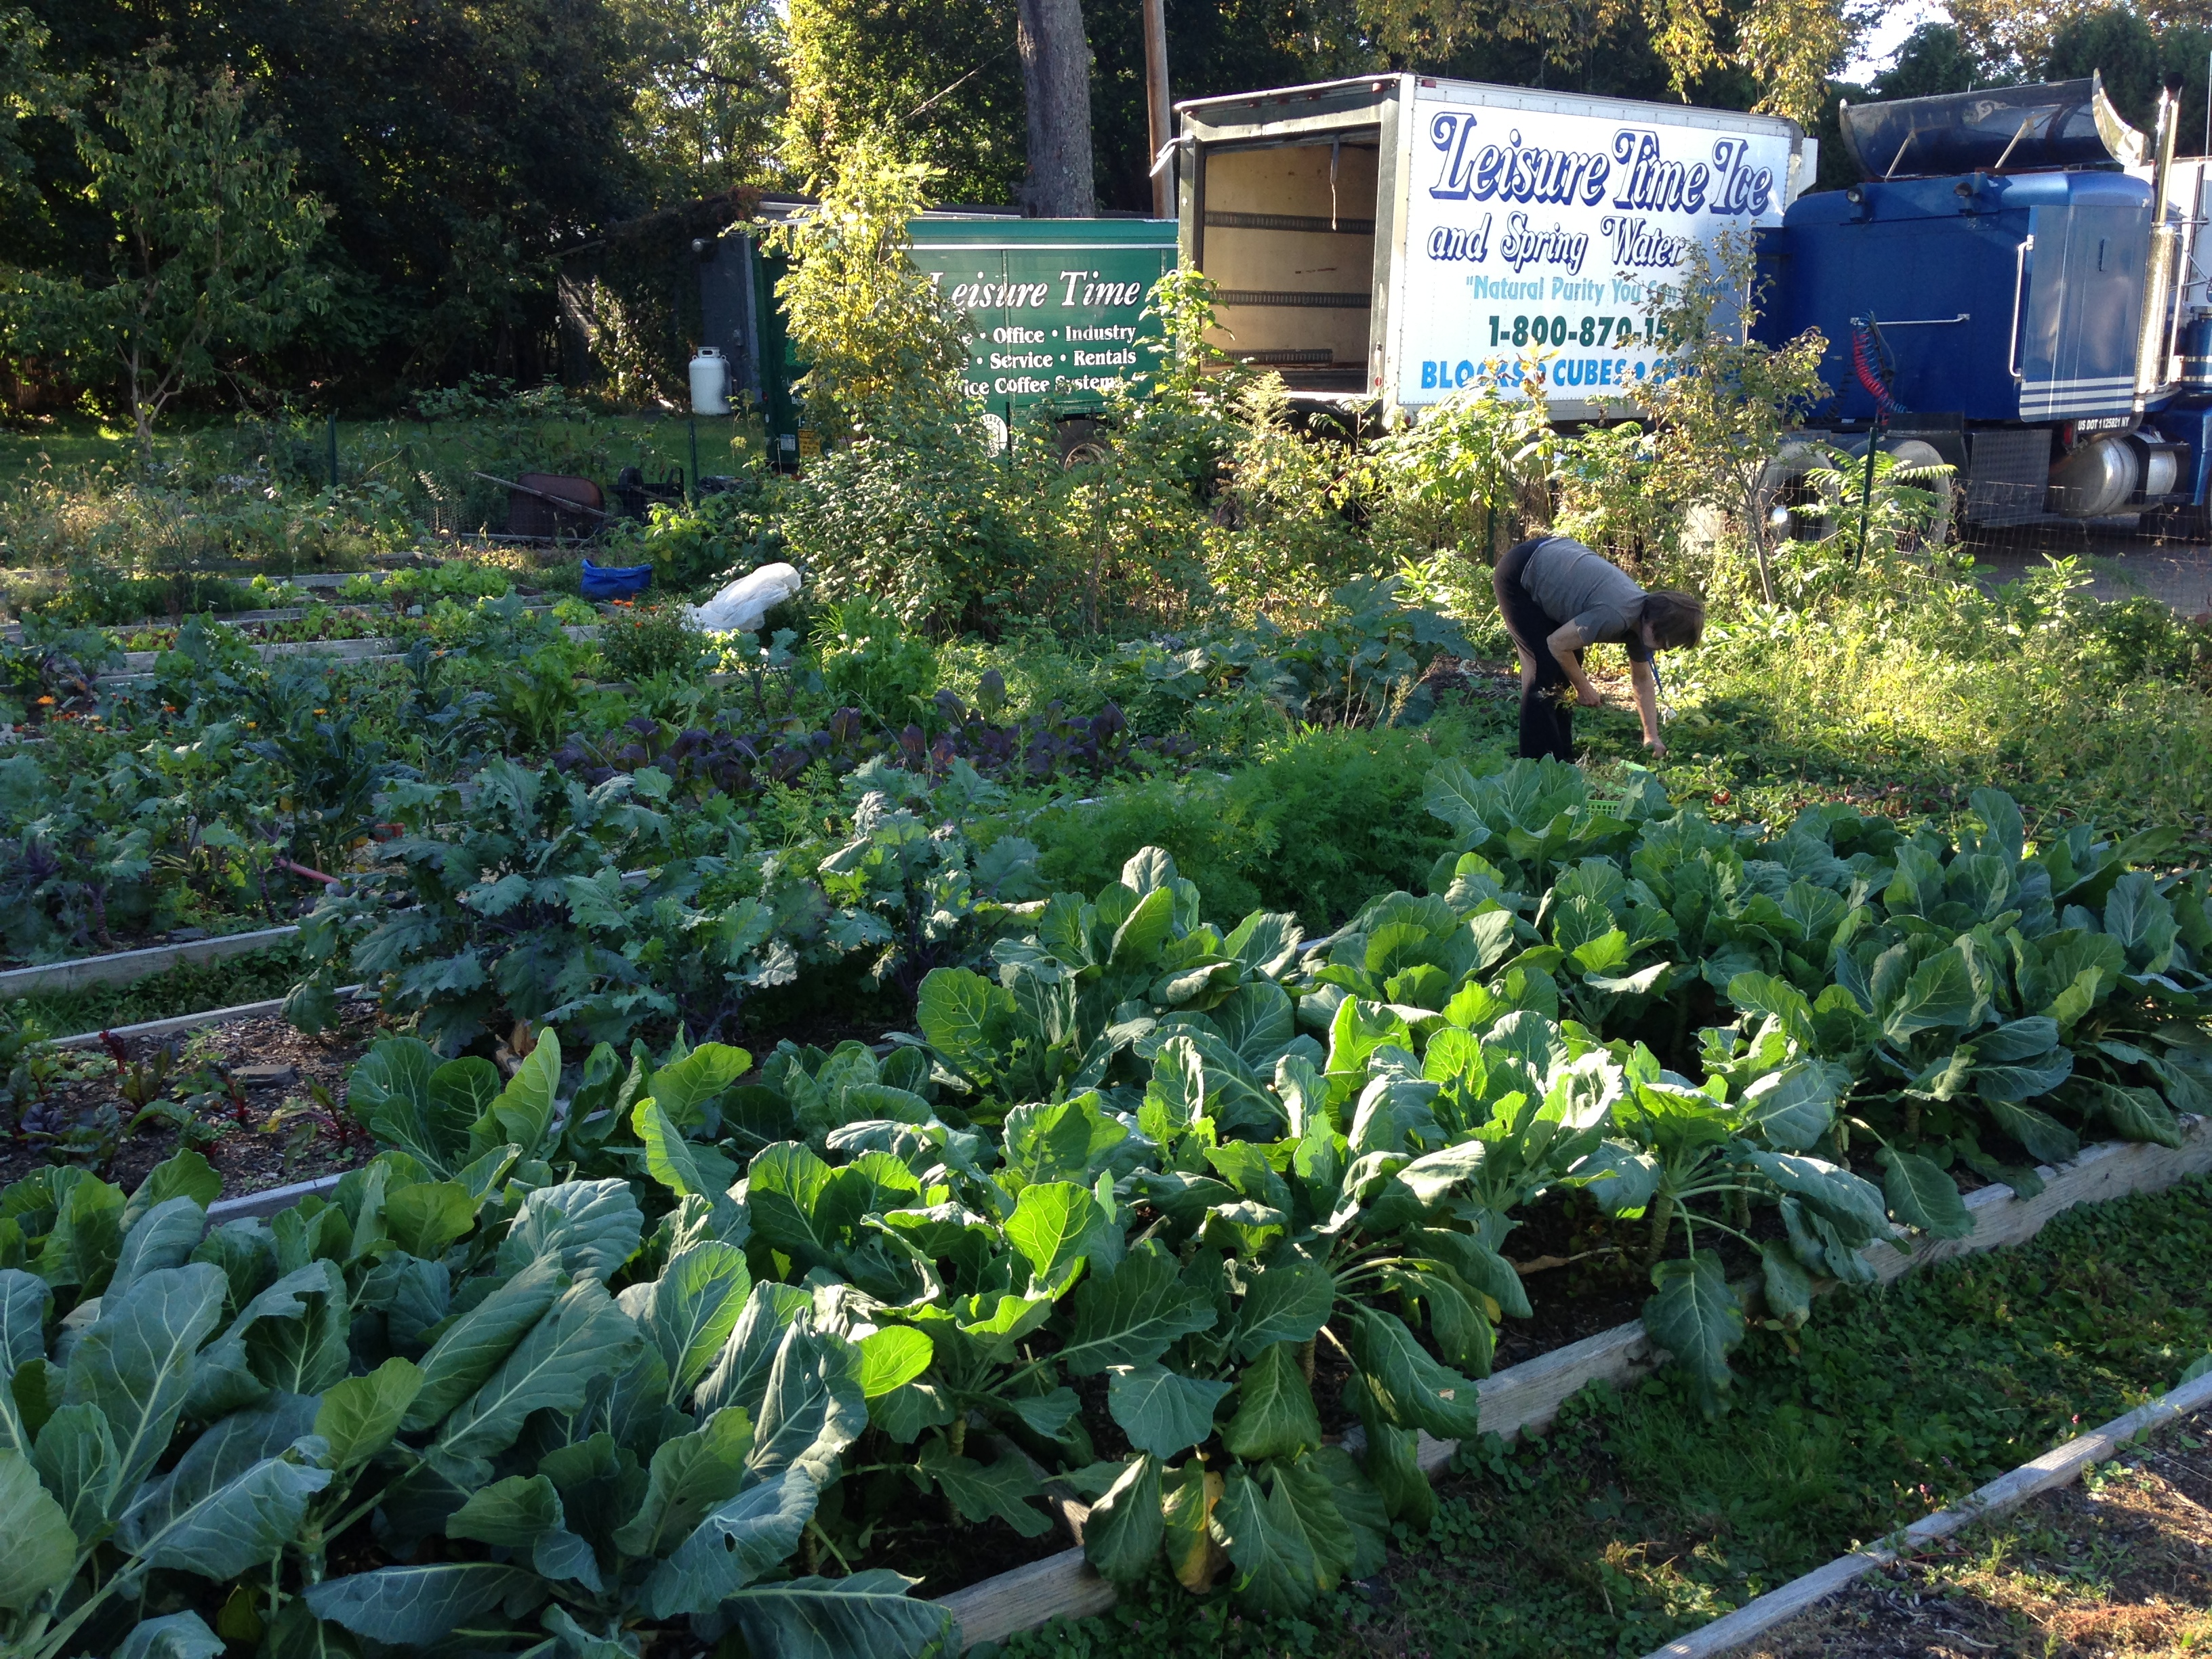 100 Food Rising Mini Farm Grow Ikea Innovative Indoor Farm Grows Greens 3 Times Faster As A